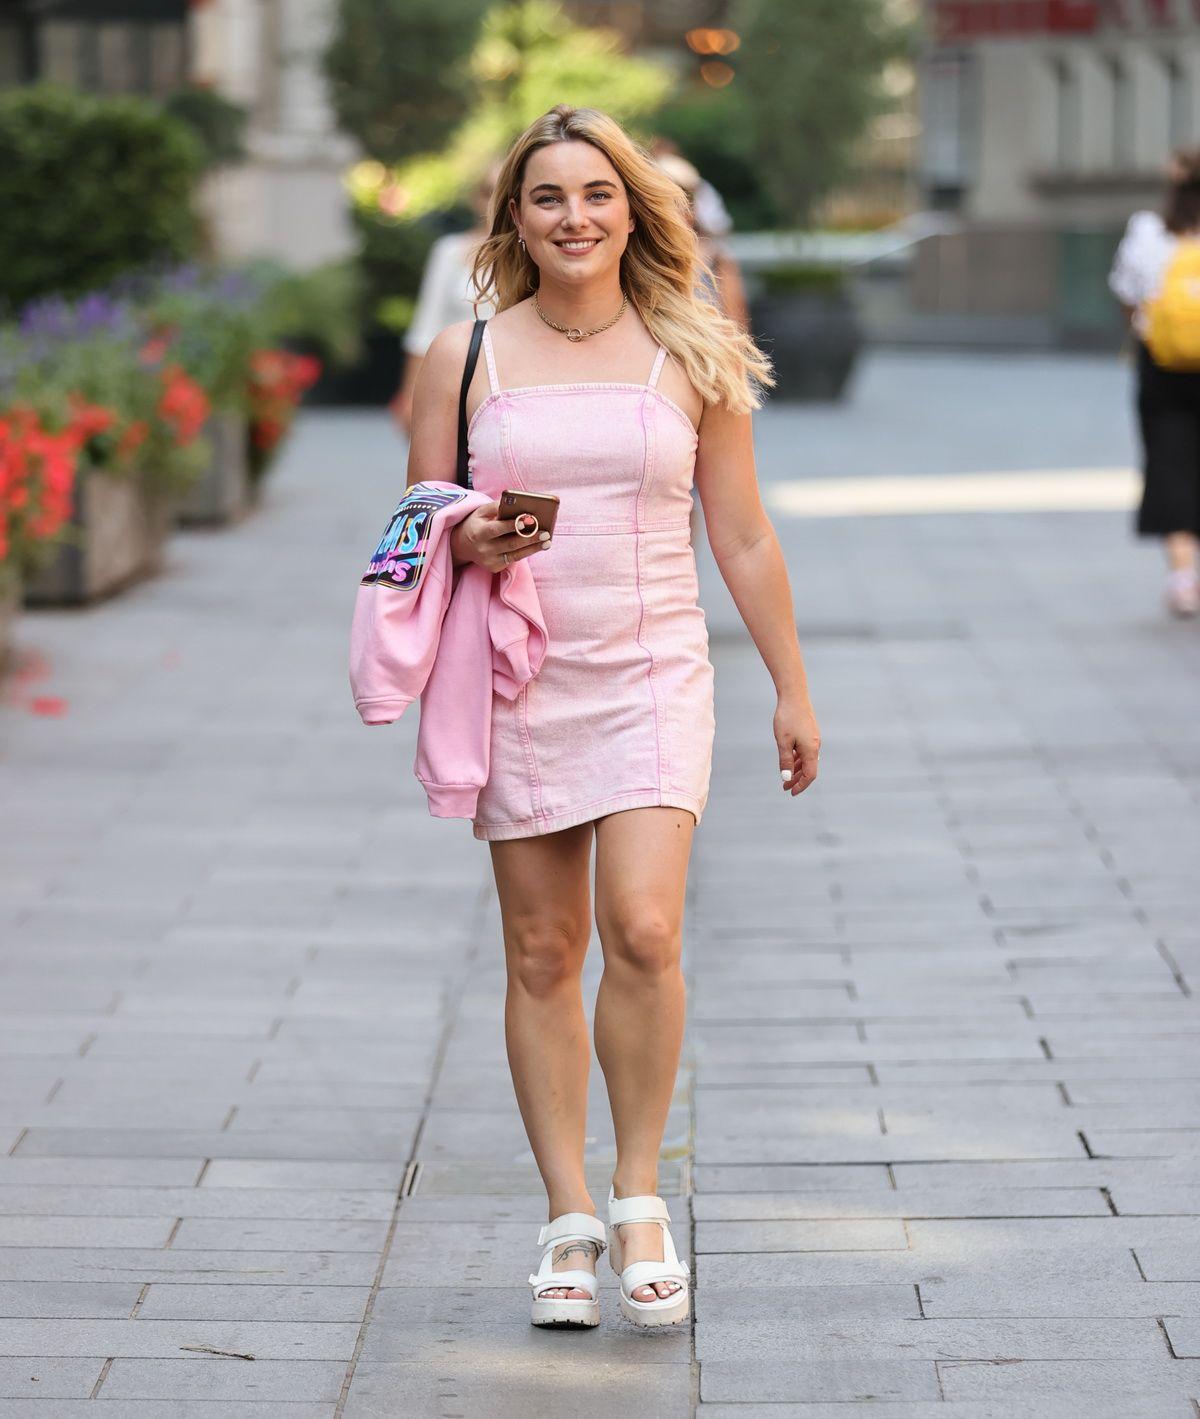 Sian Welby Pink Denim Mini Dress Out London